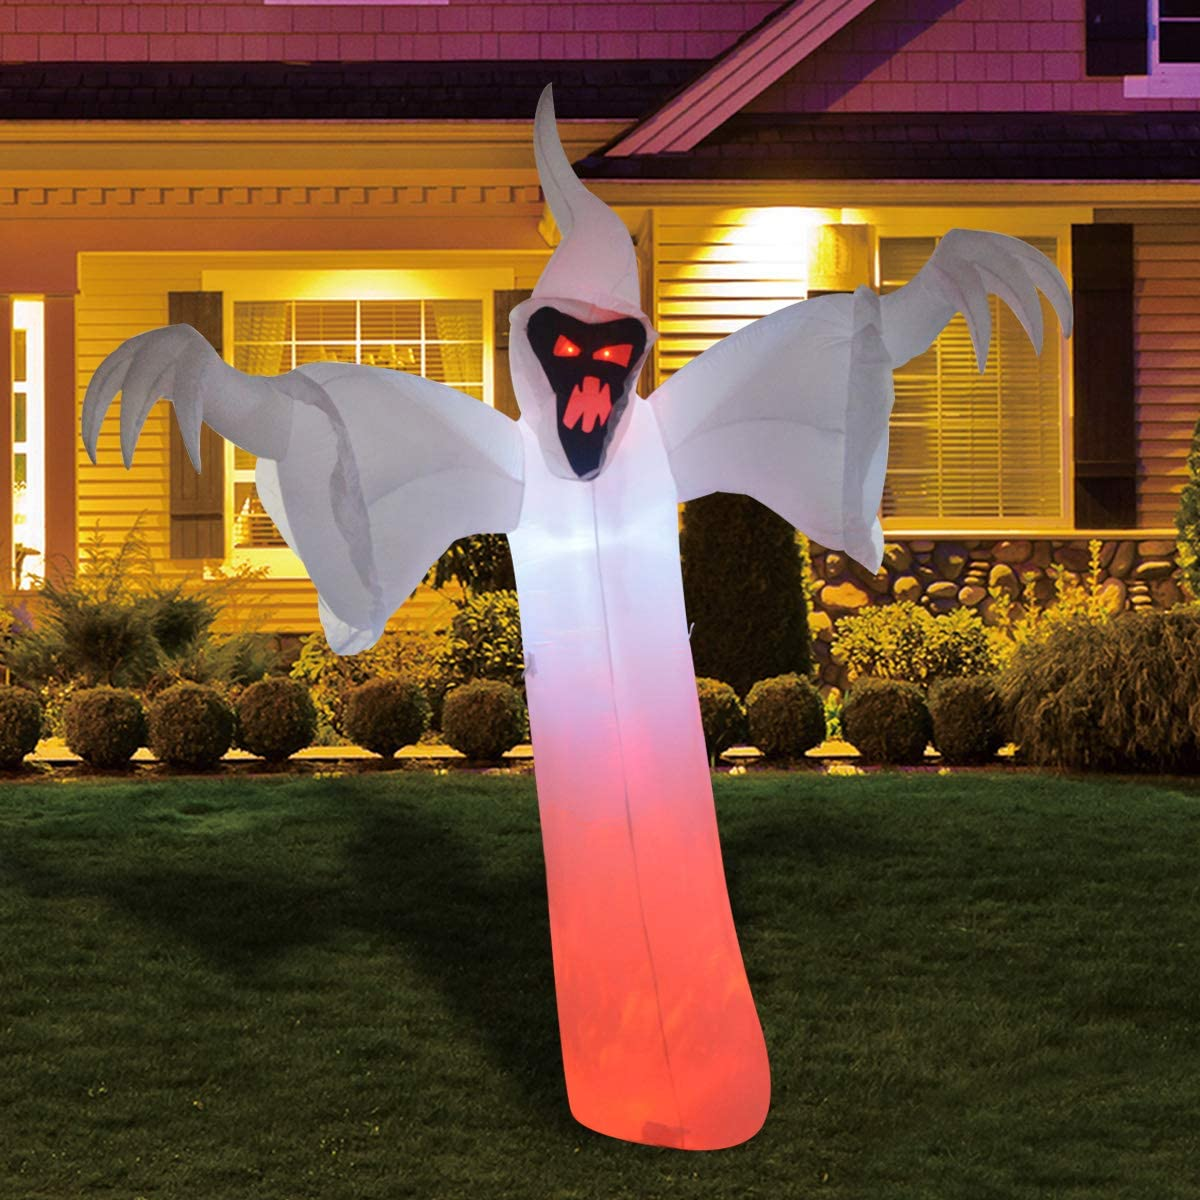 GOOSH 12 Foot High Halloween Inflatable Narrow face Ghost Yard Decoration, Indoor Outdoor Garden Halloween Decoration.